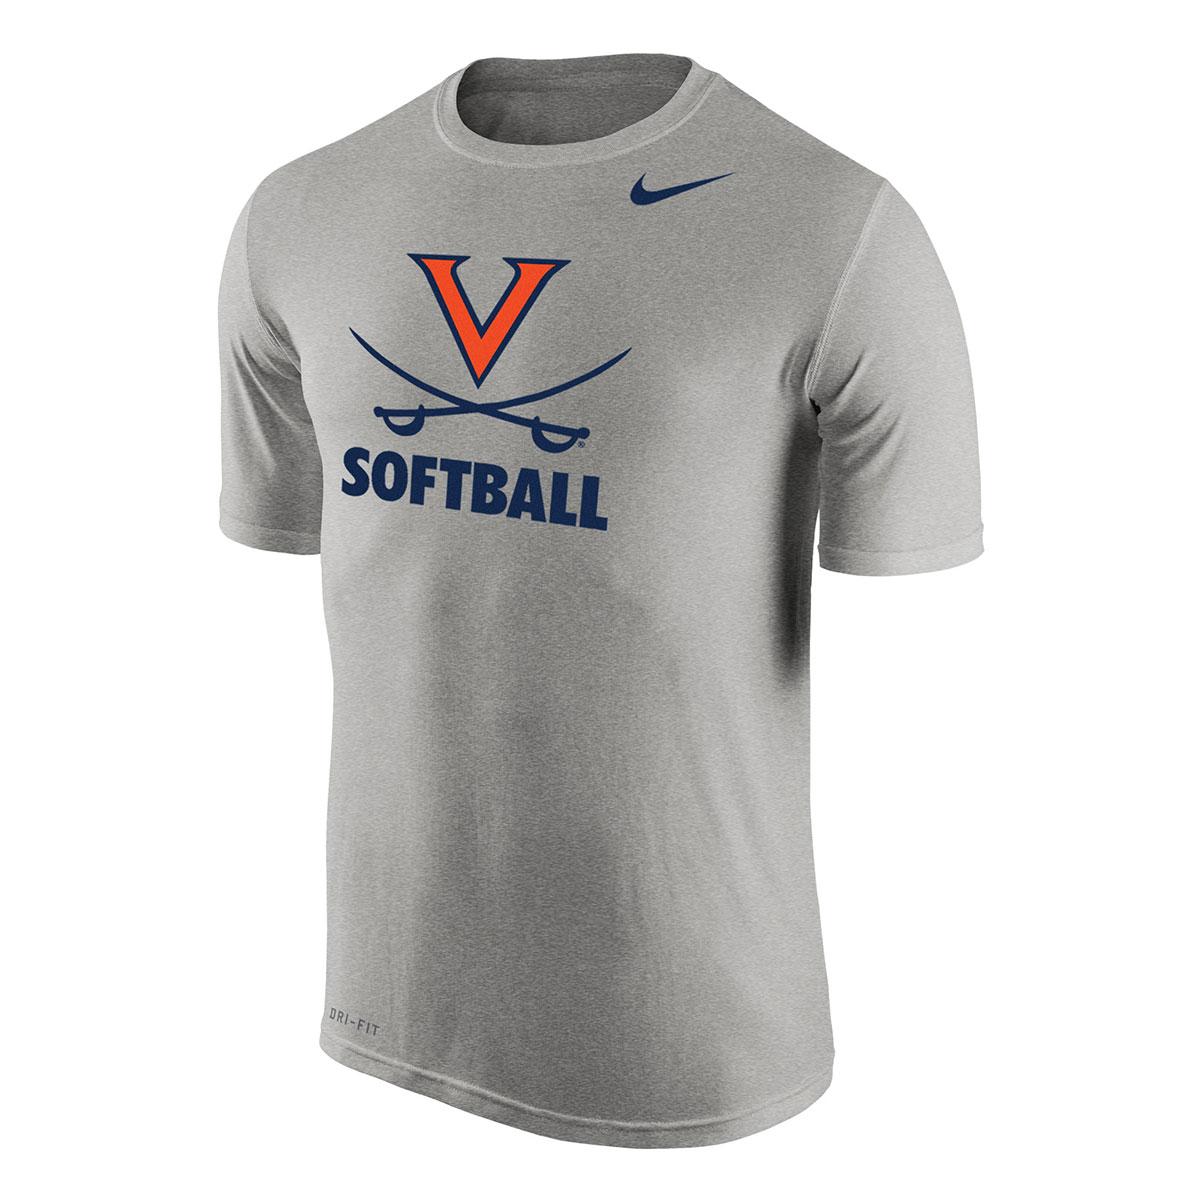 University of Virginia Softball NIKE Dri-Fit T-shirt